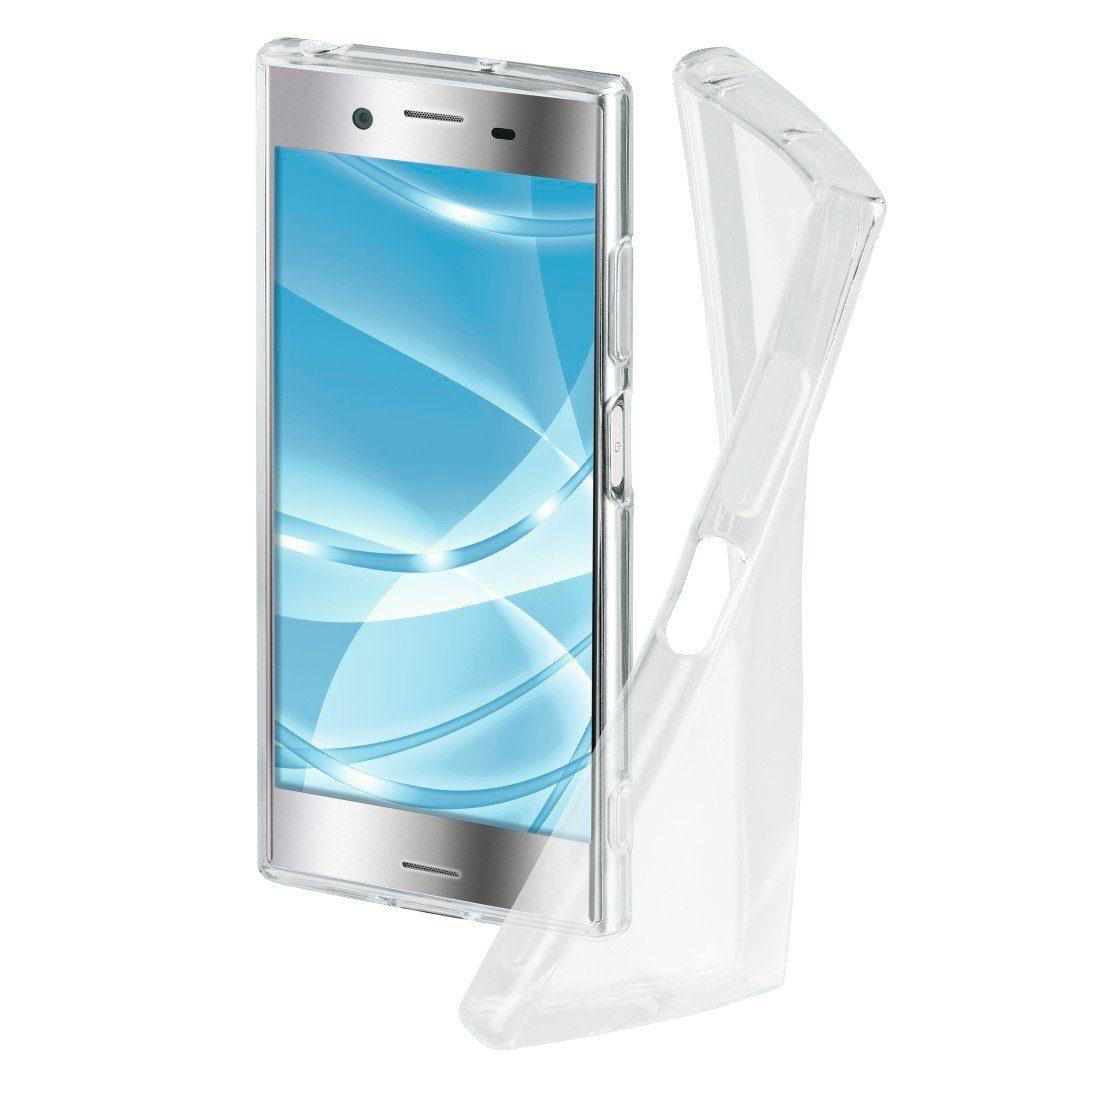 Hama Cover Crystal Clear für Sony Xperia XZ Premium, Transparent